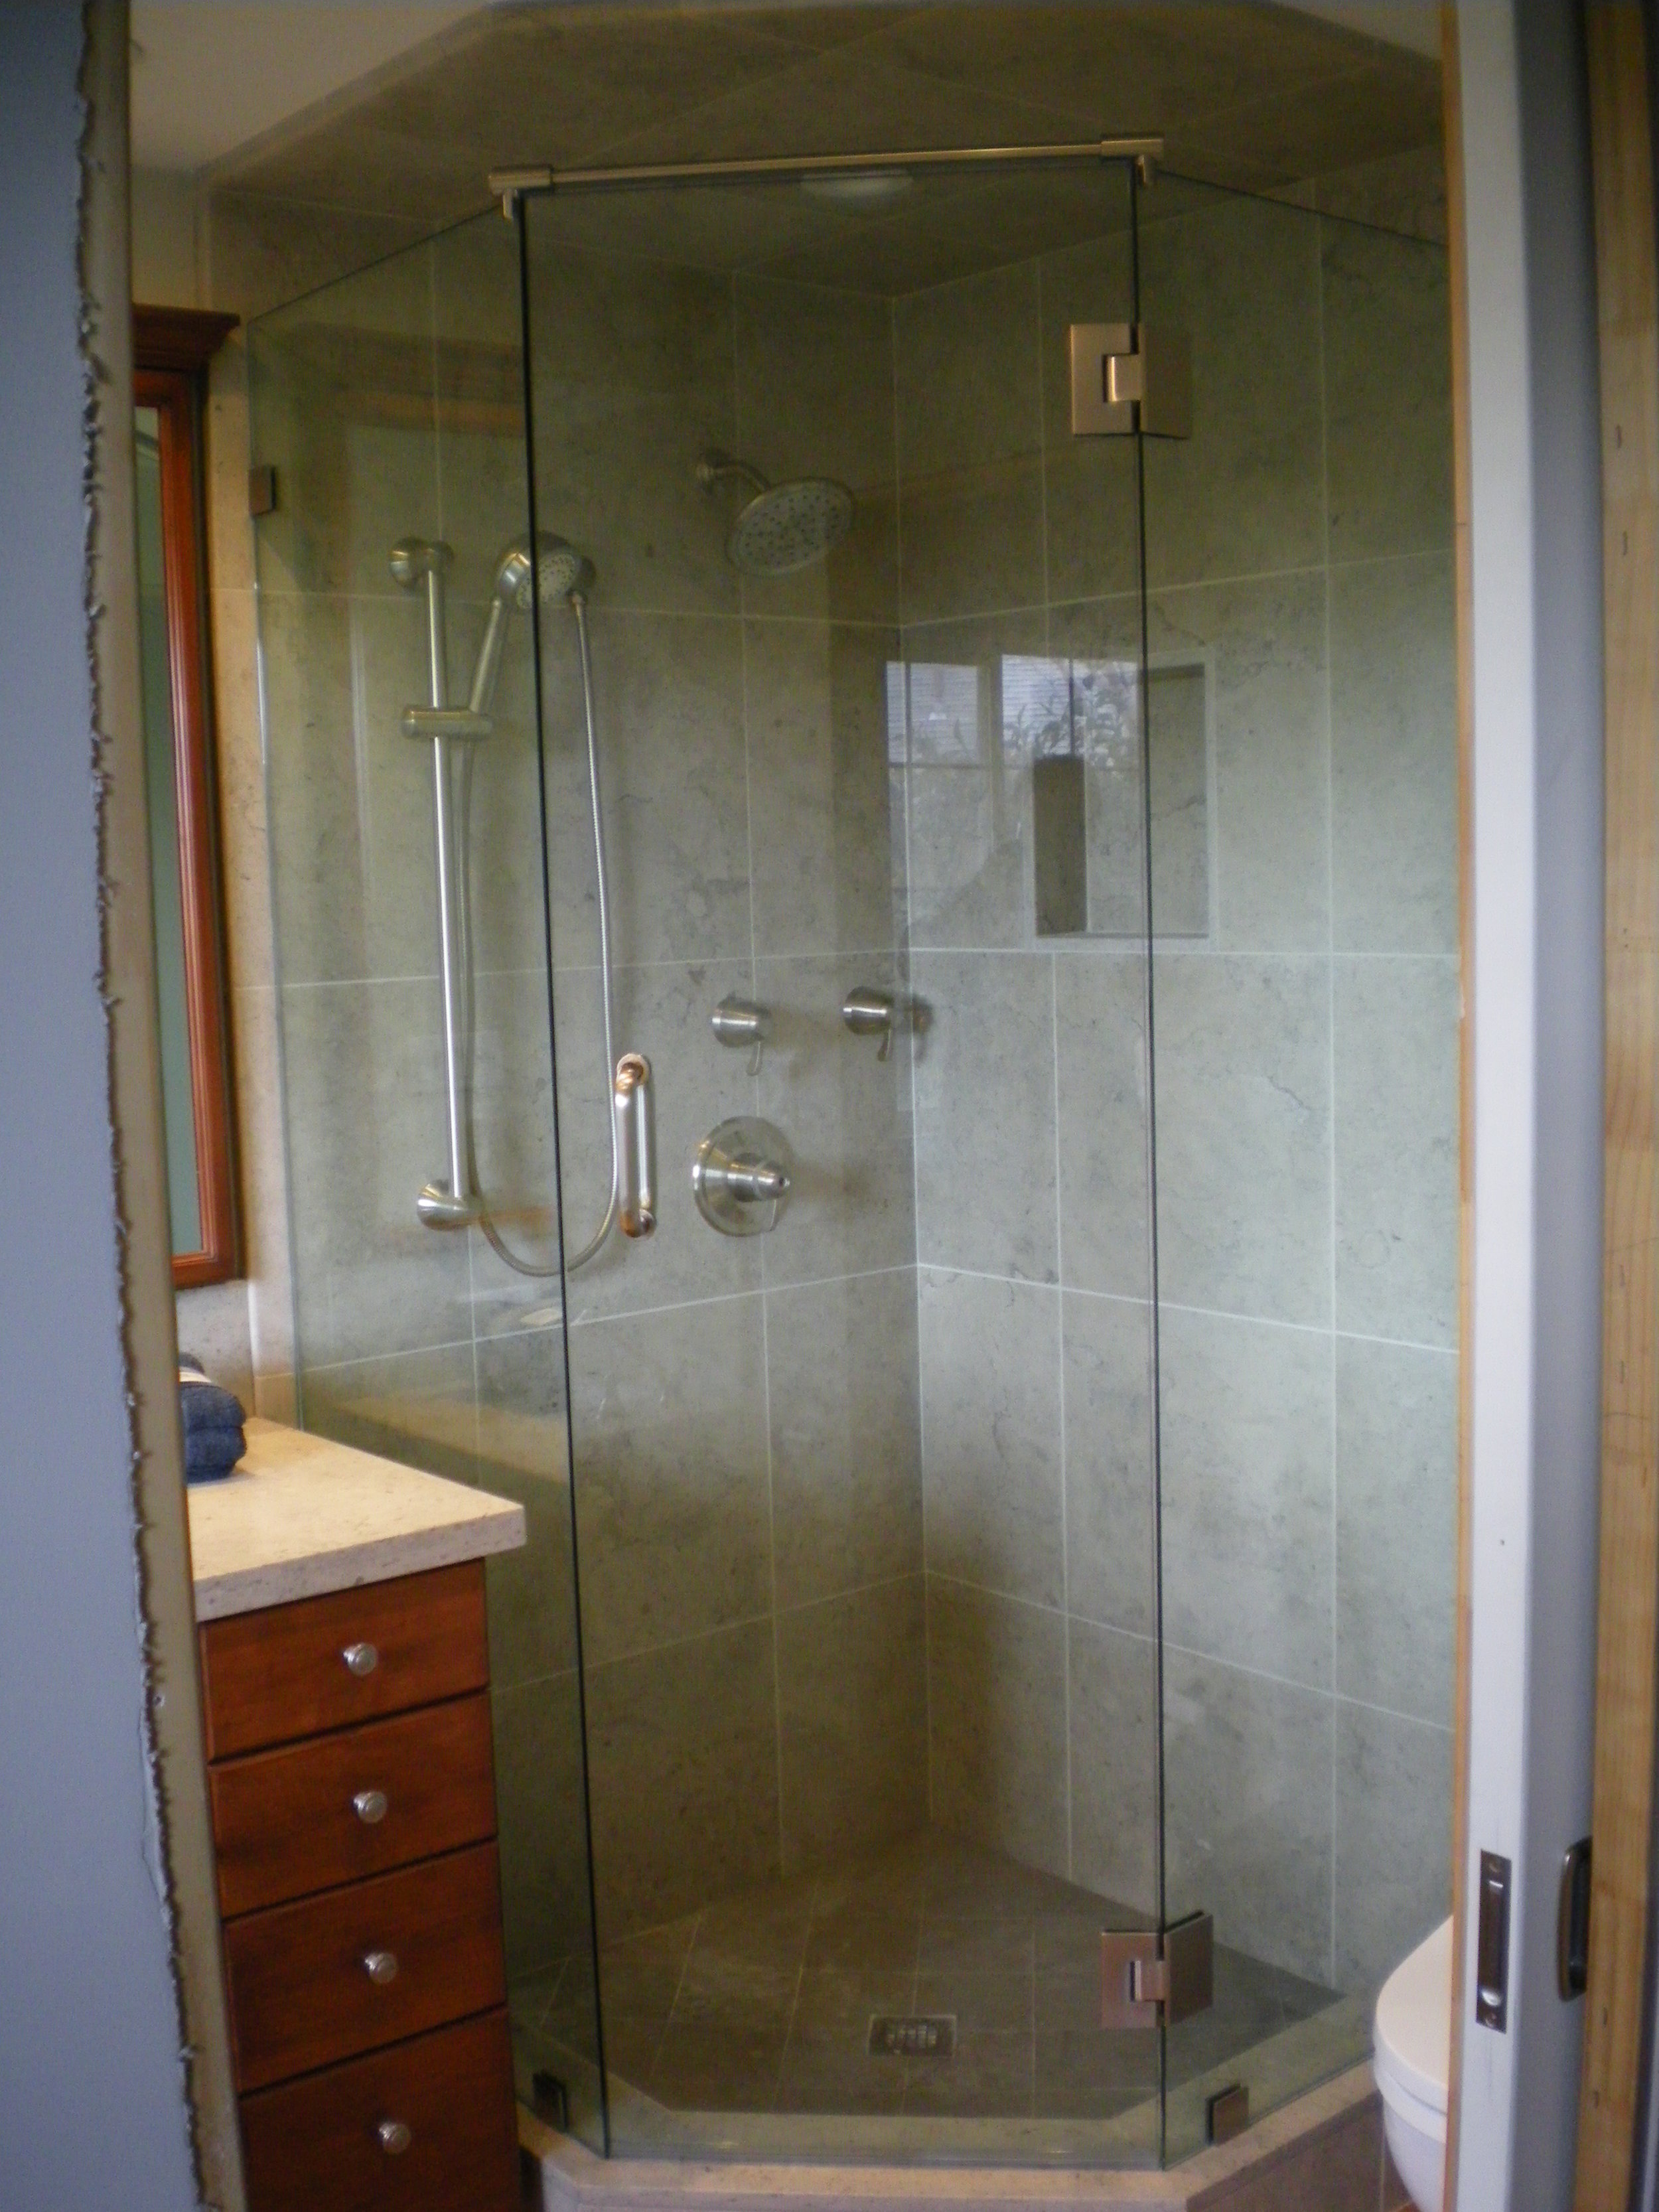 Shower-Doors-Residential-Photos-8.jpg